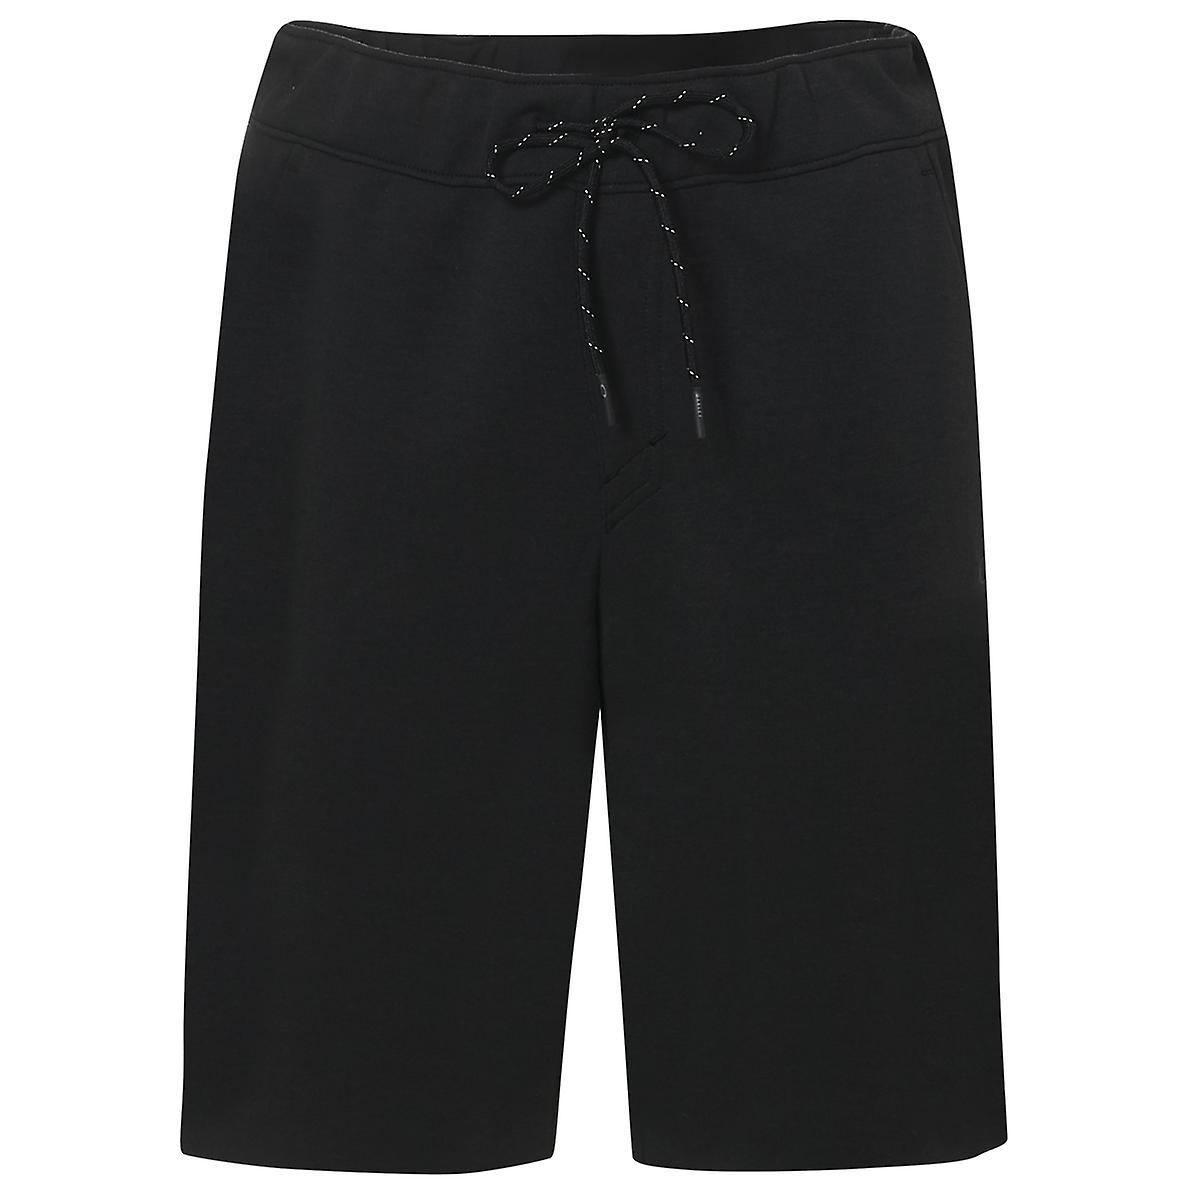 Shorts d'entraînement Oakley Mens Tech Knit Hydrolix Comfort Jogger nkU6me